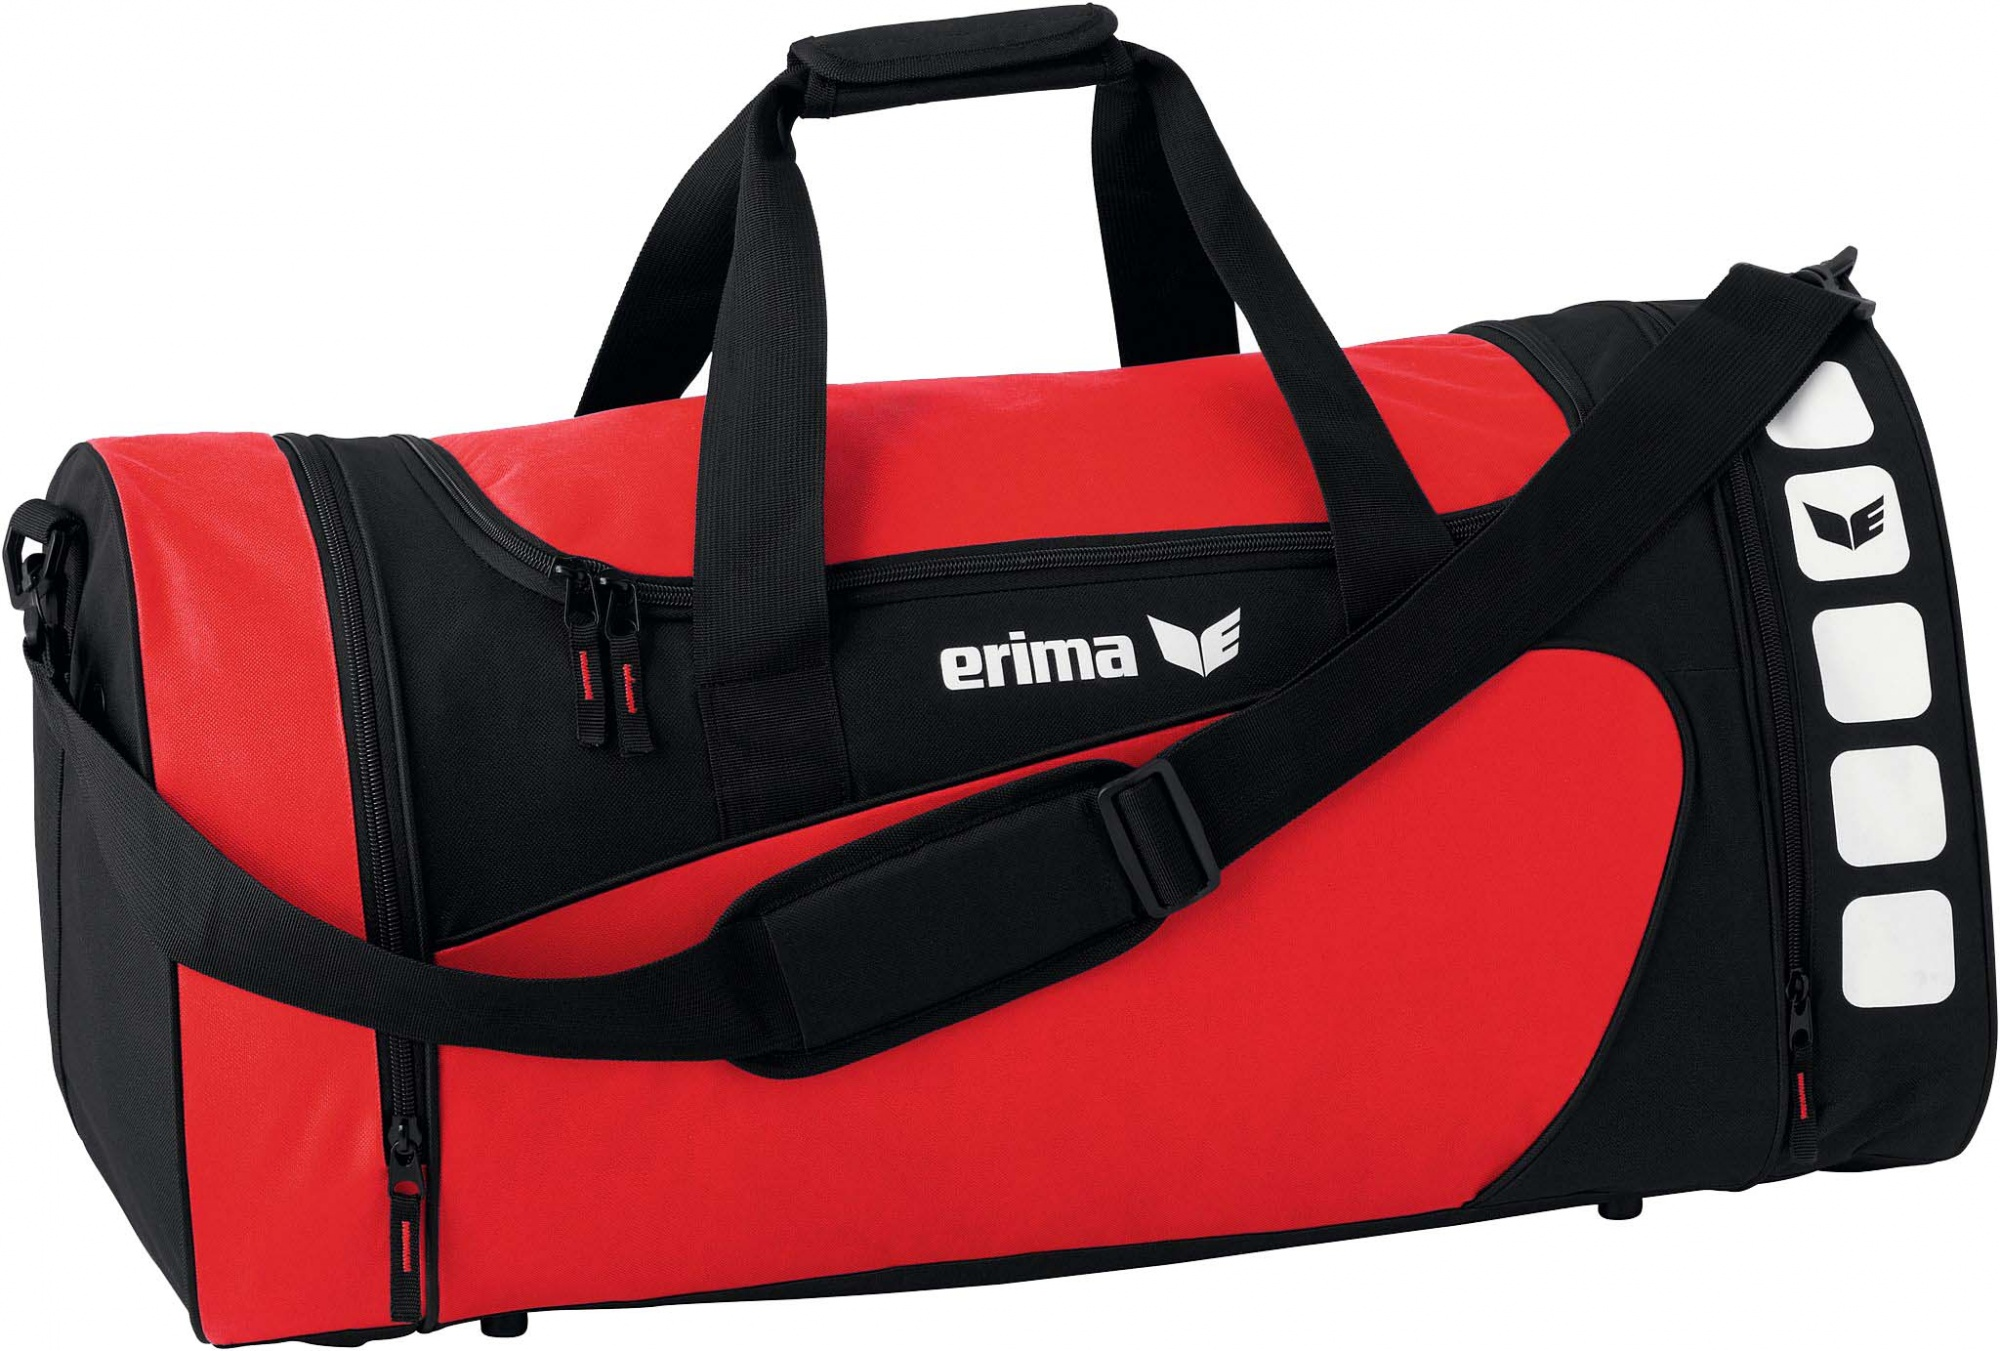 5 Liter Twm Black 49 Bag Red Line 5 Erima Club Sports 54LcRAS3jq